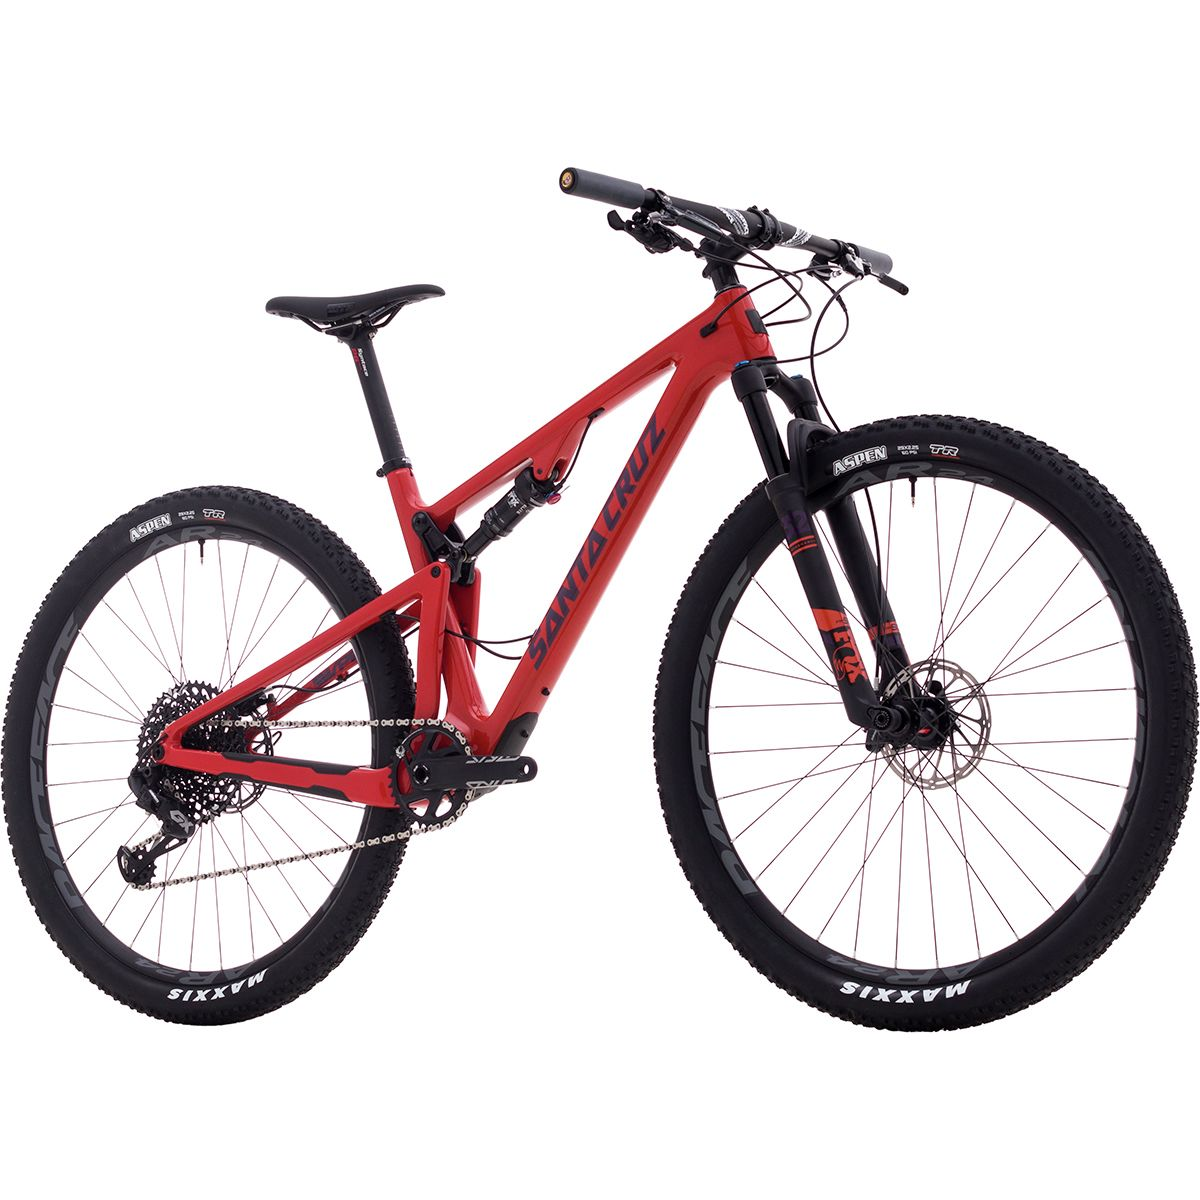 1200x1200 Santa Cruz Bicycles Blur Carbon R Complete Mountain Bike